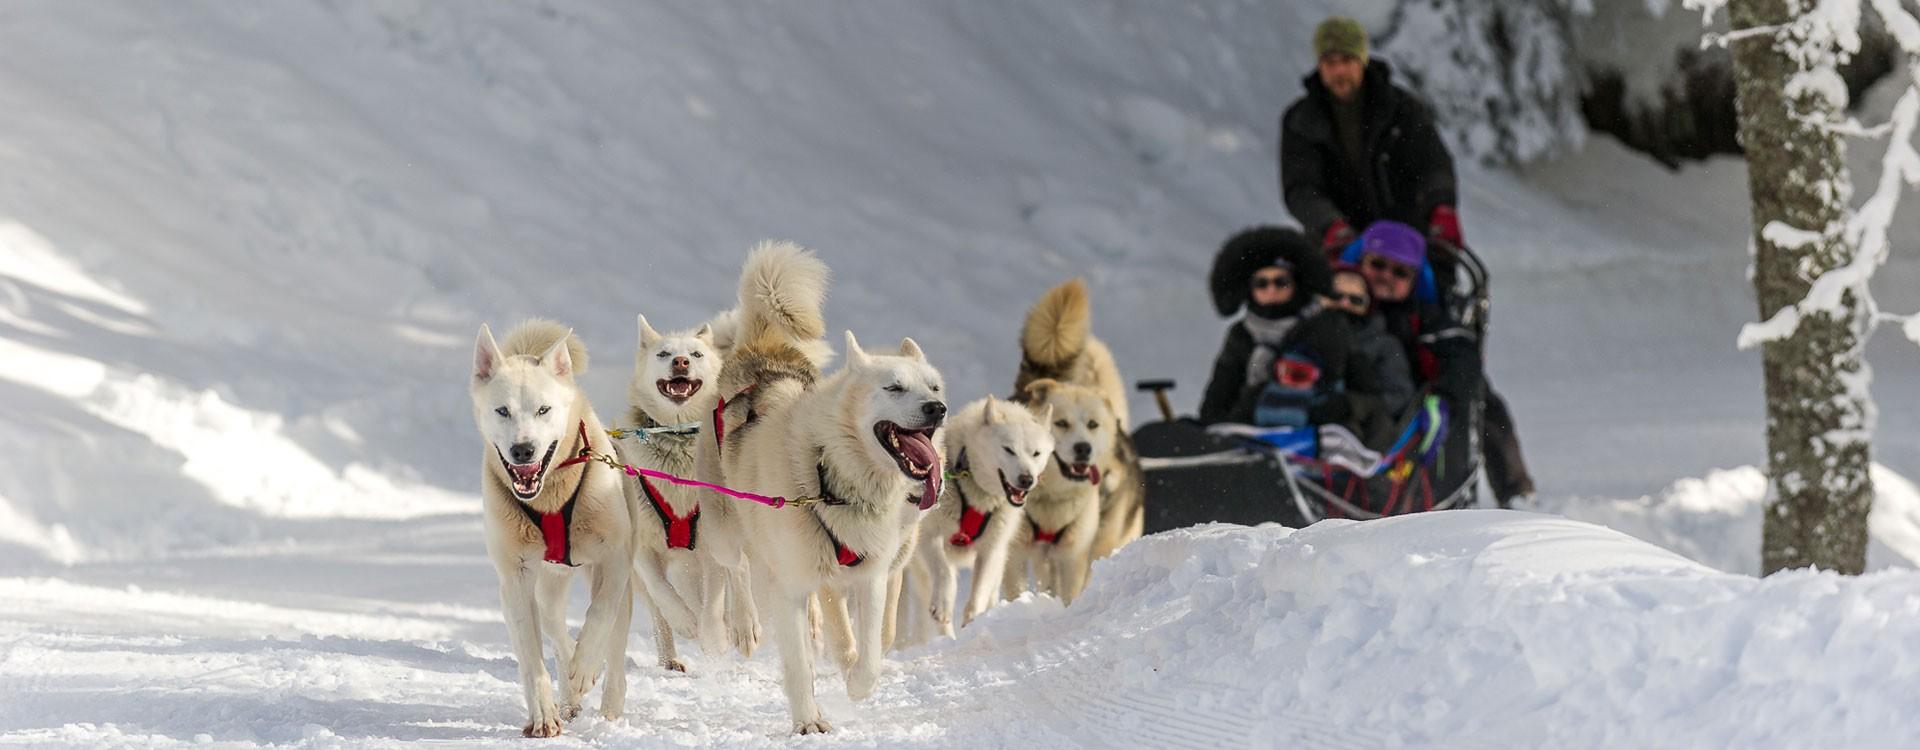 chiens-hiver-585